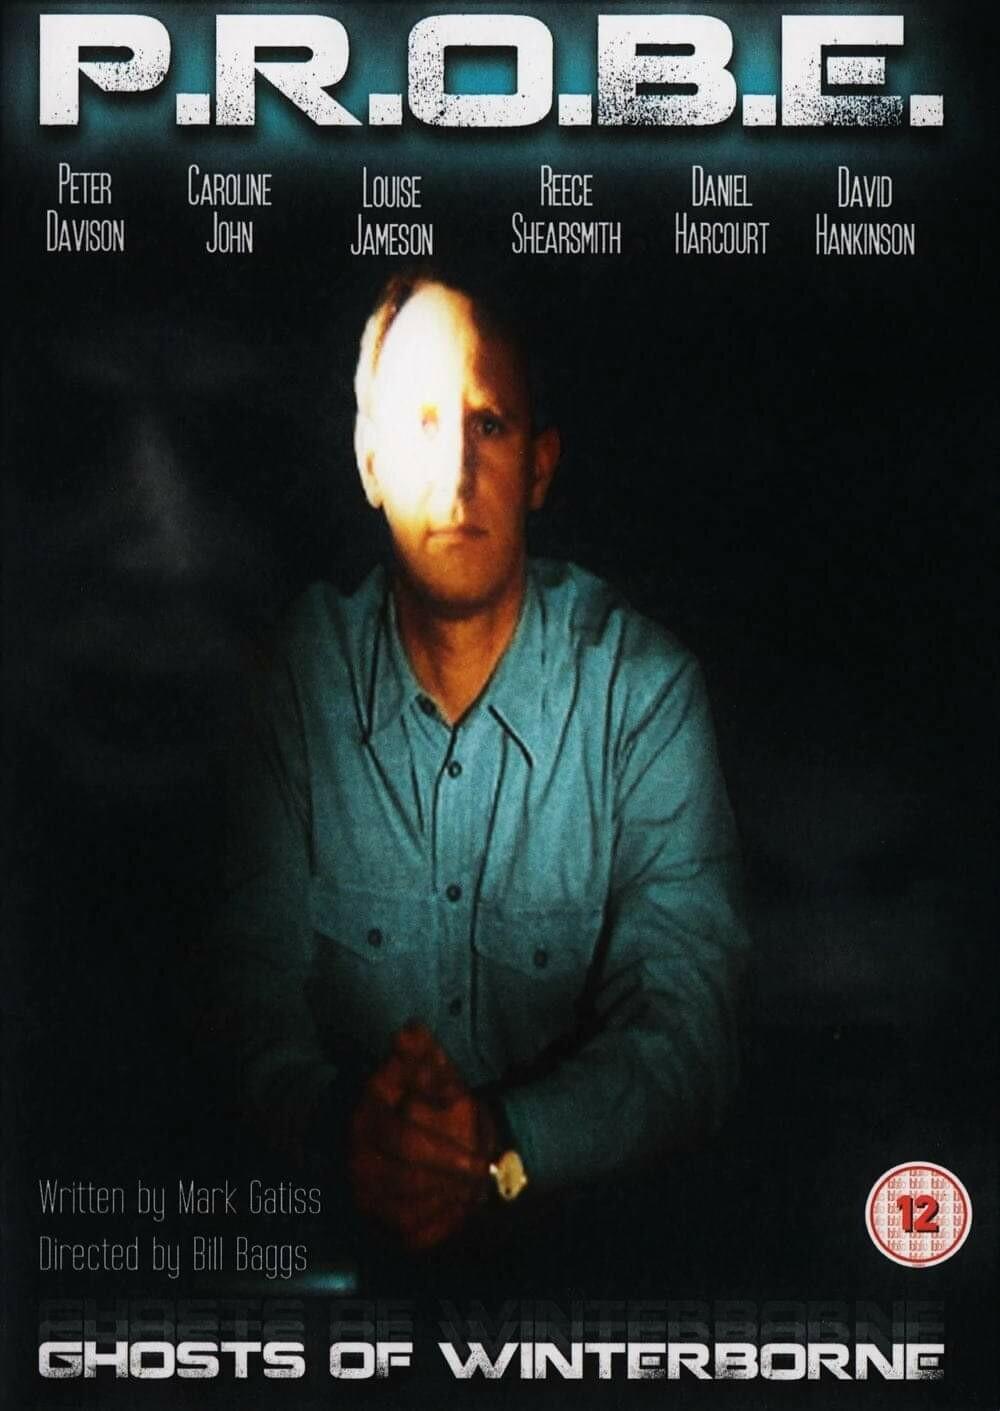 P.R.O.B.E. LIZ SHAW: Ghosts of Winterborne (DVD)